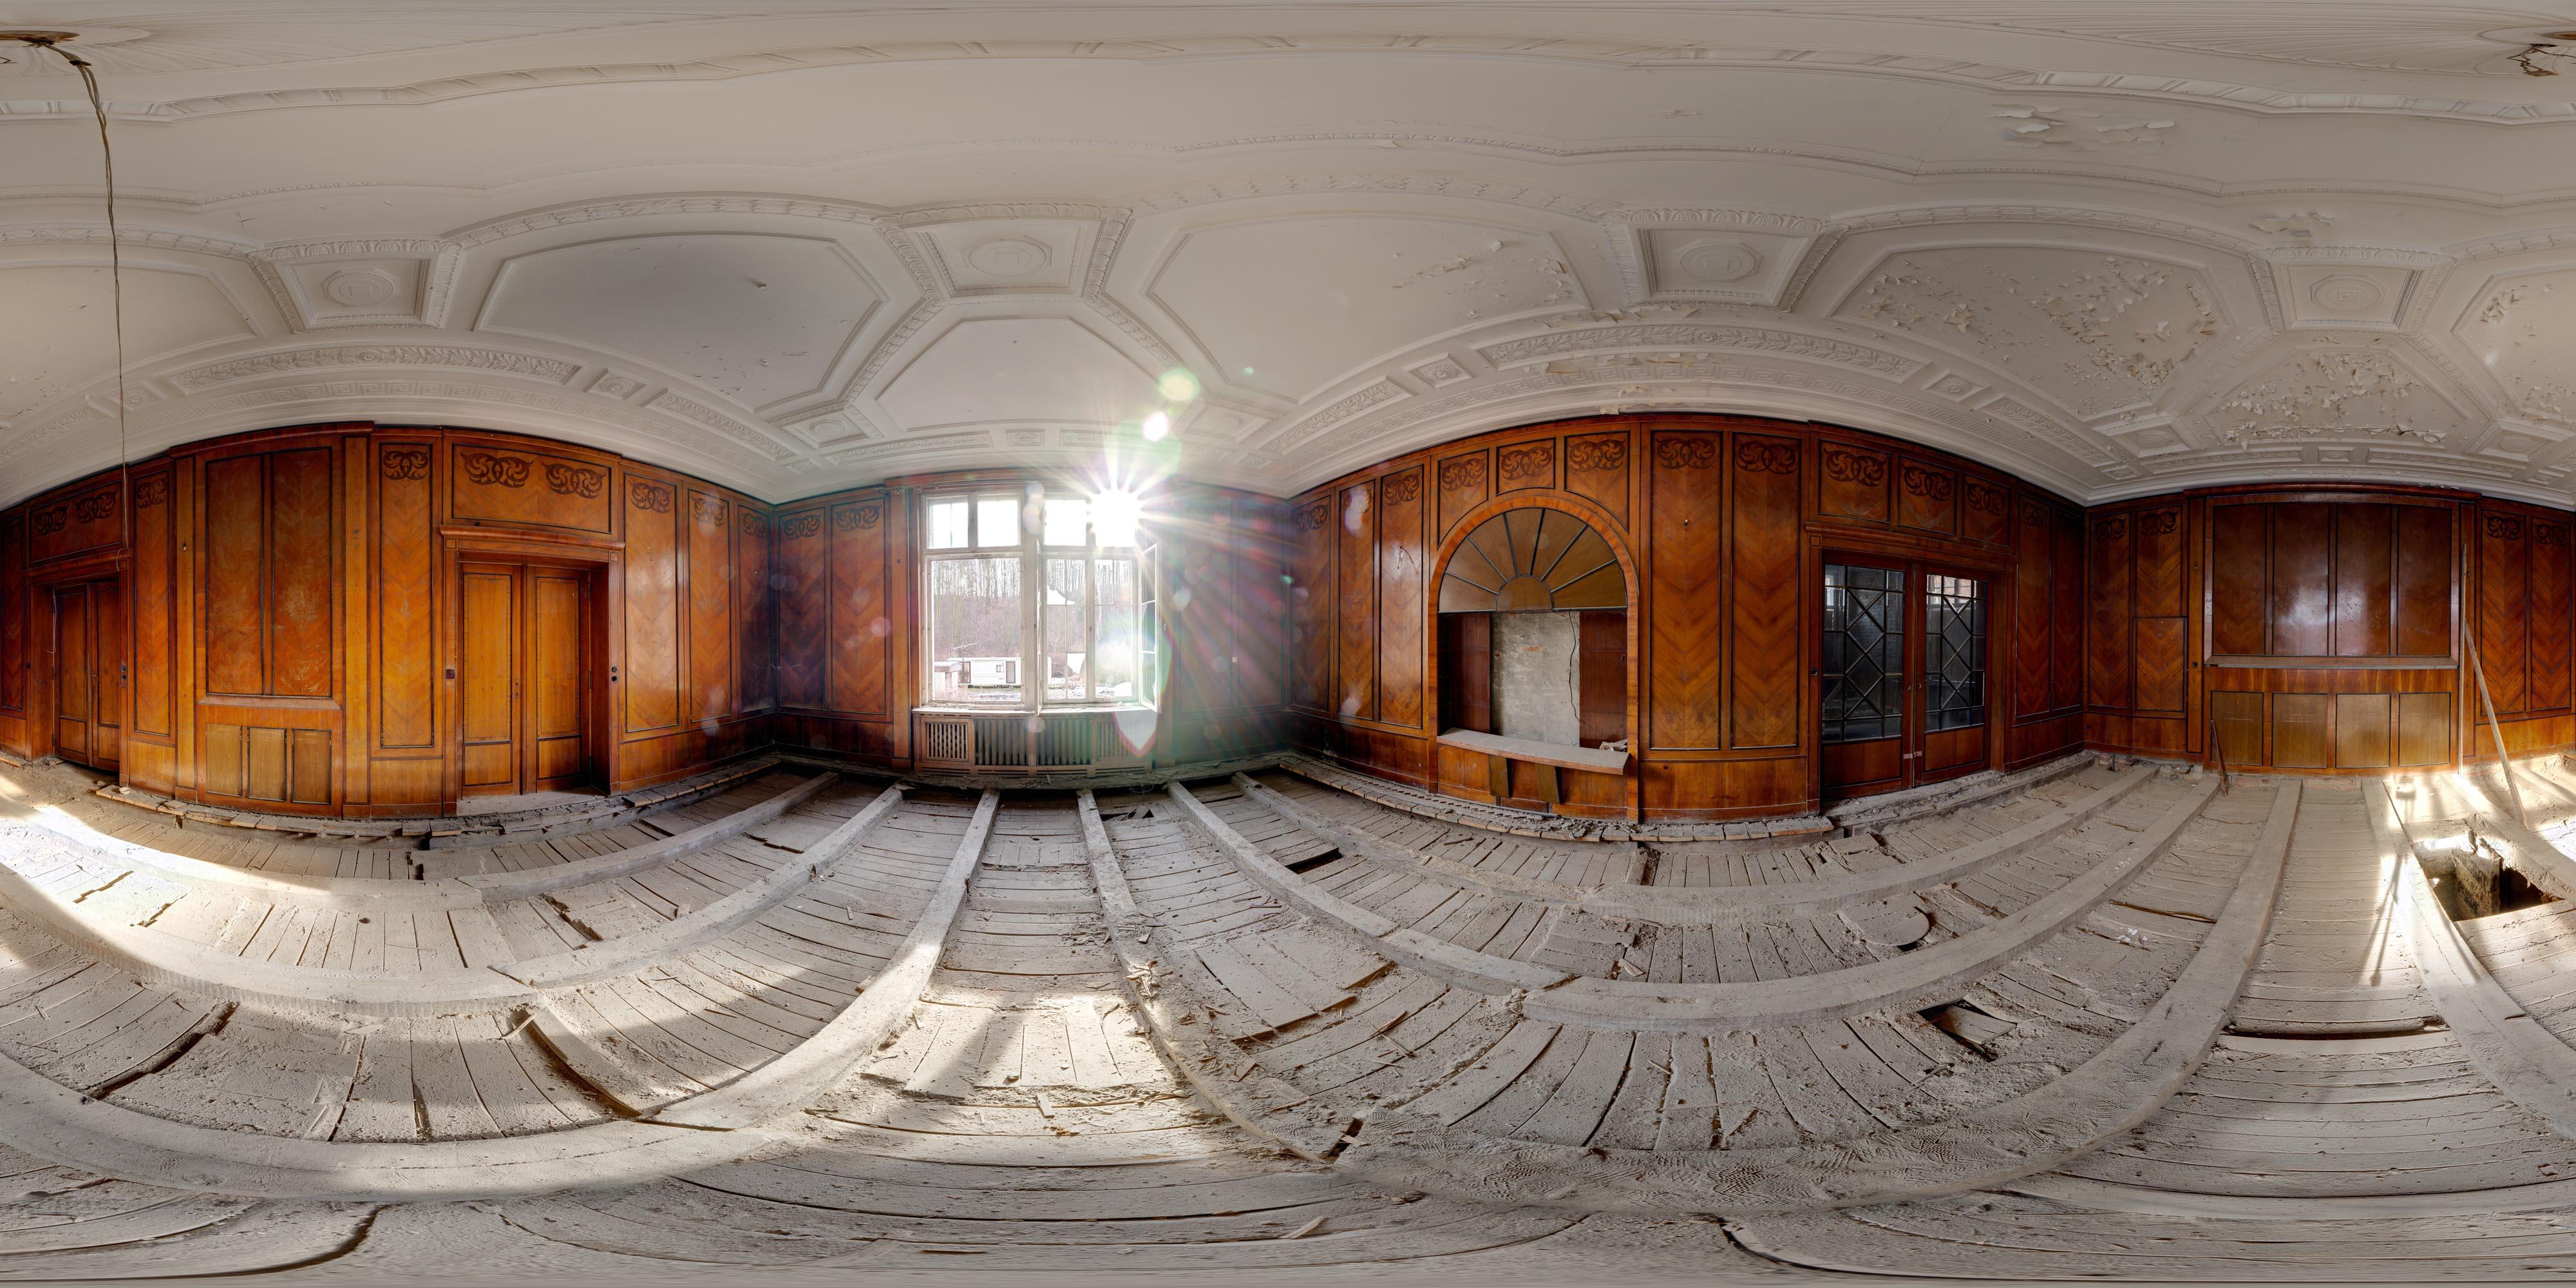 Interior Room 1 Environment Panoramas Texturify Free Textures